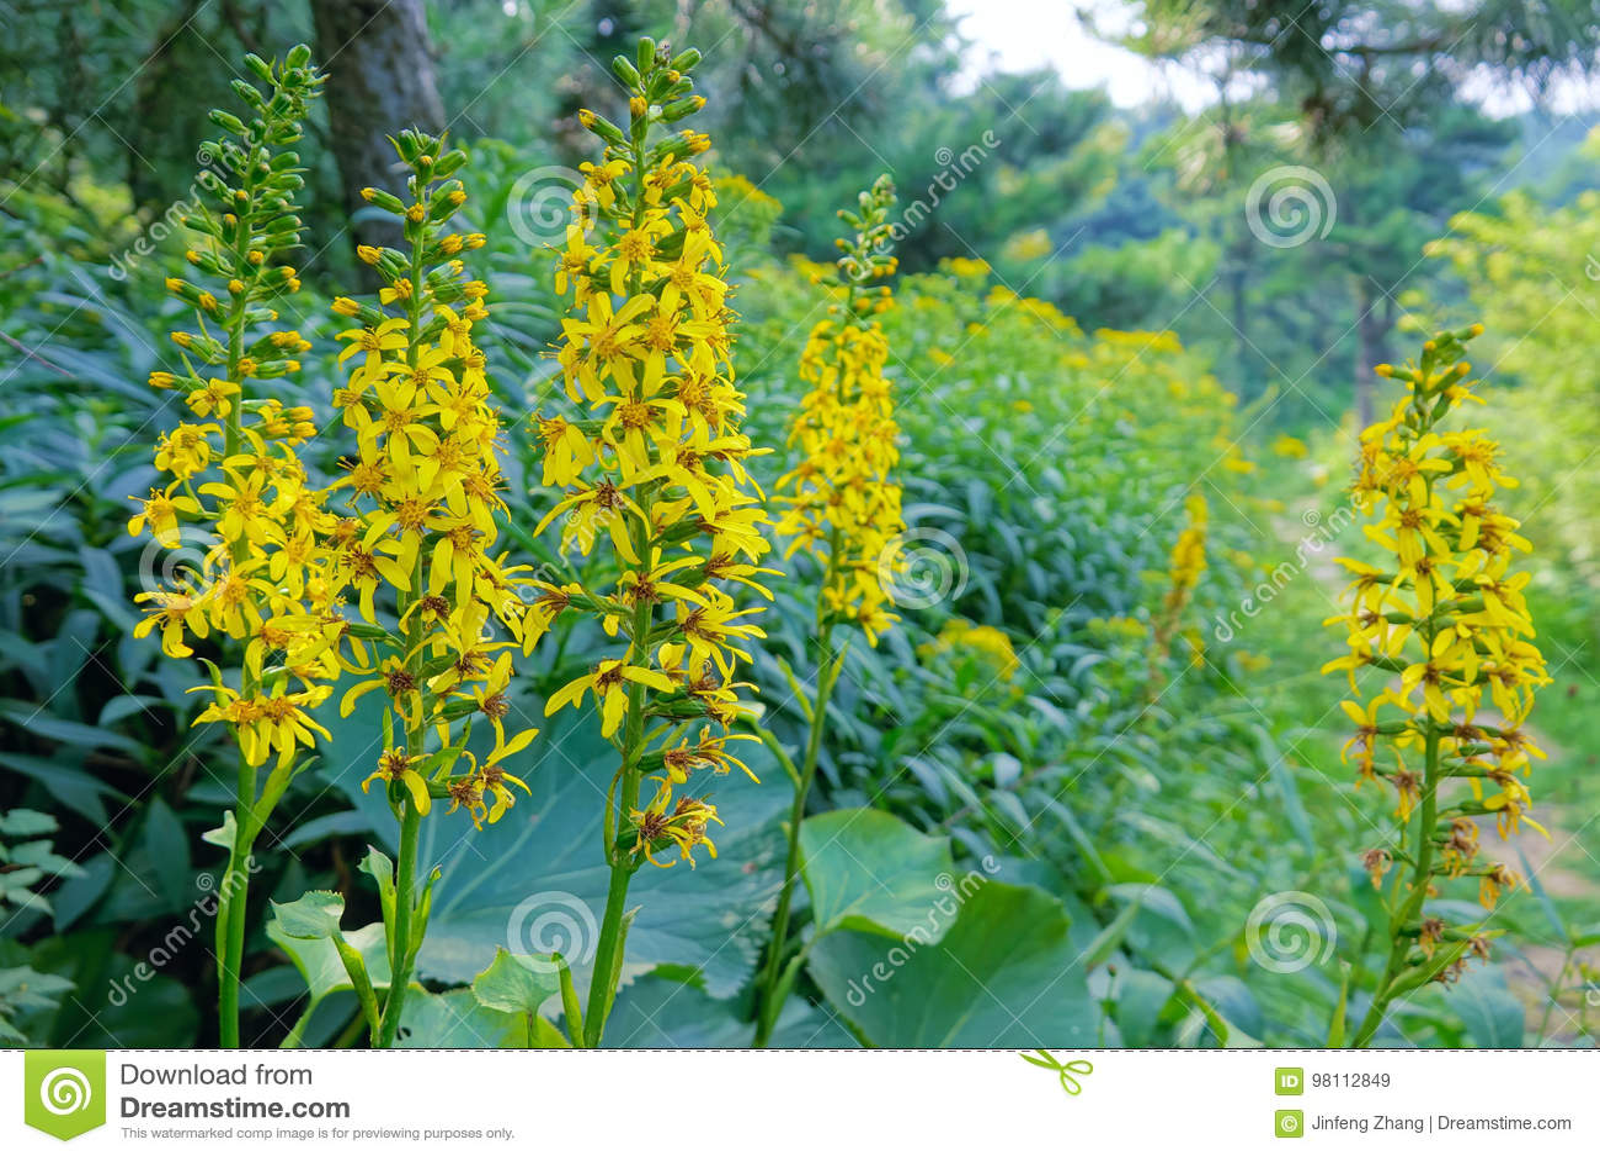 Ligularia flowers